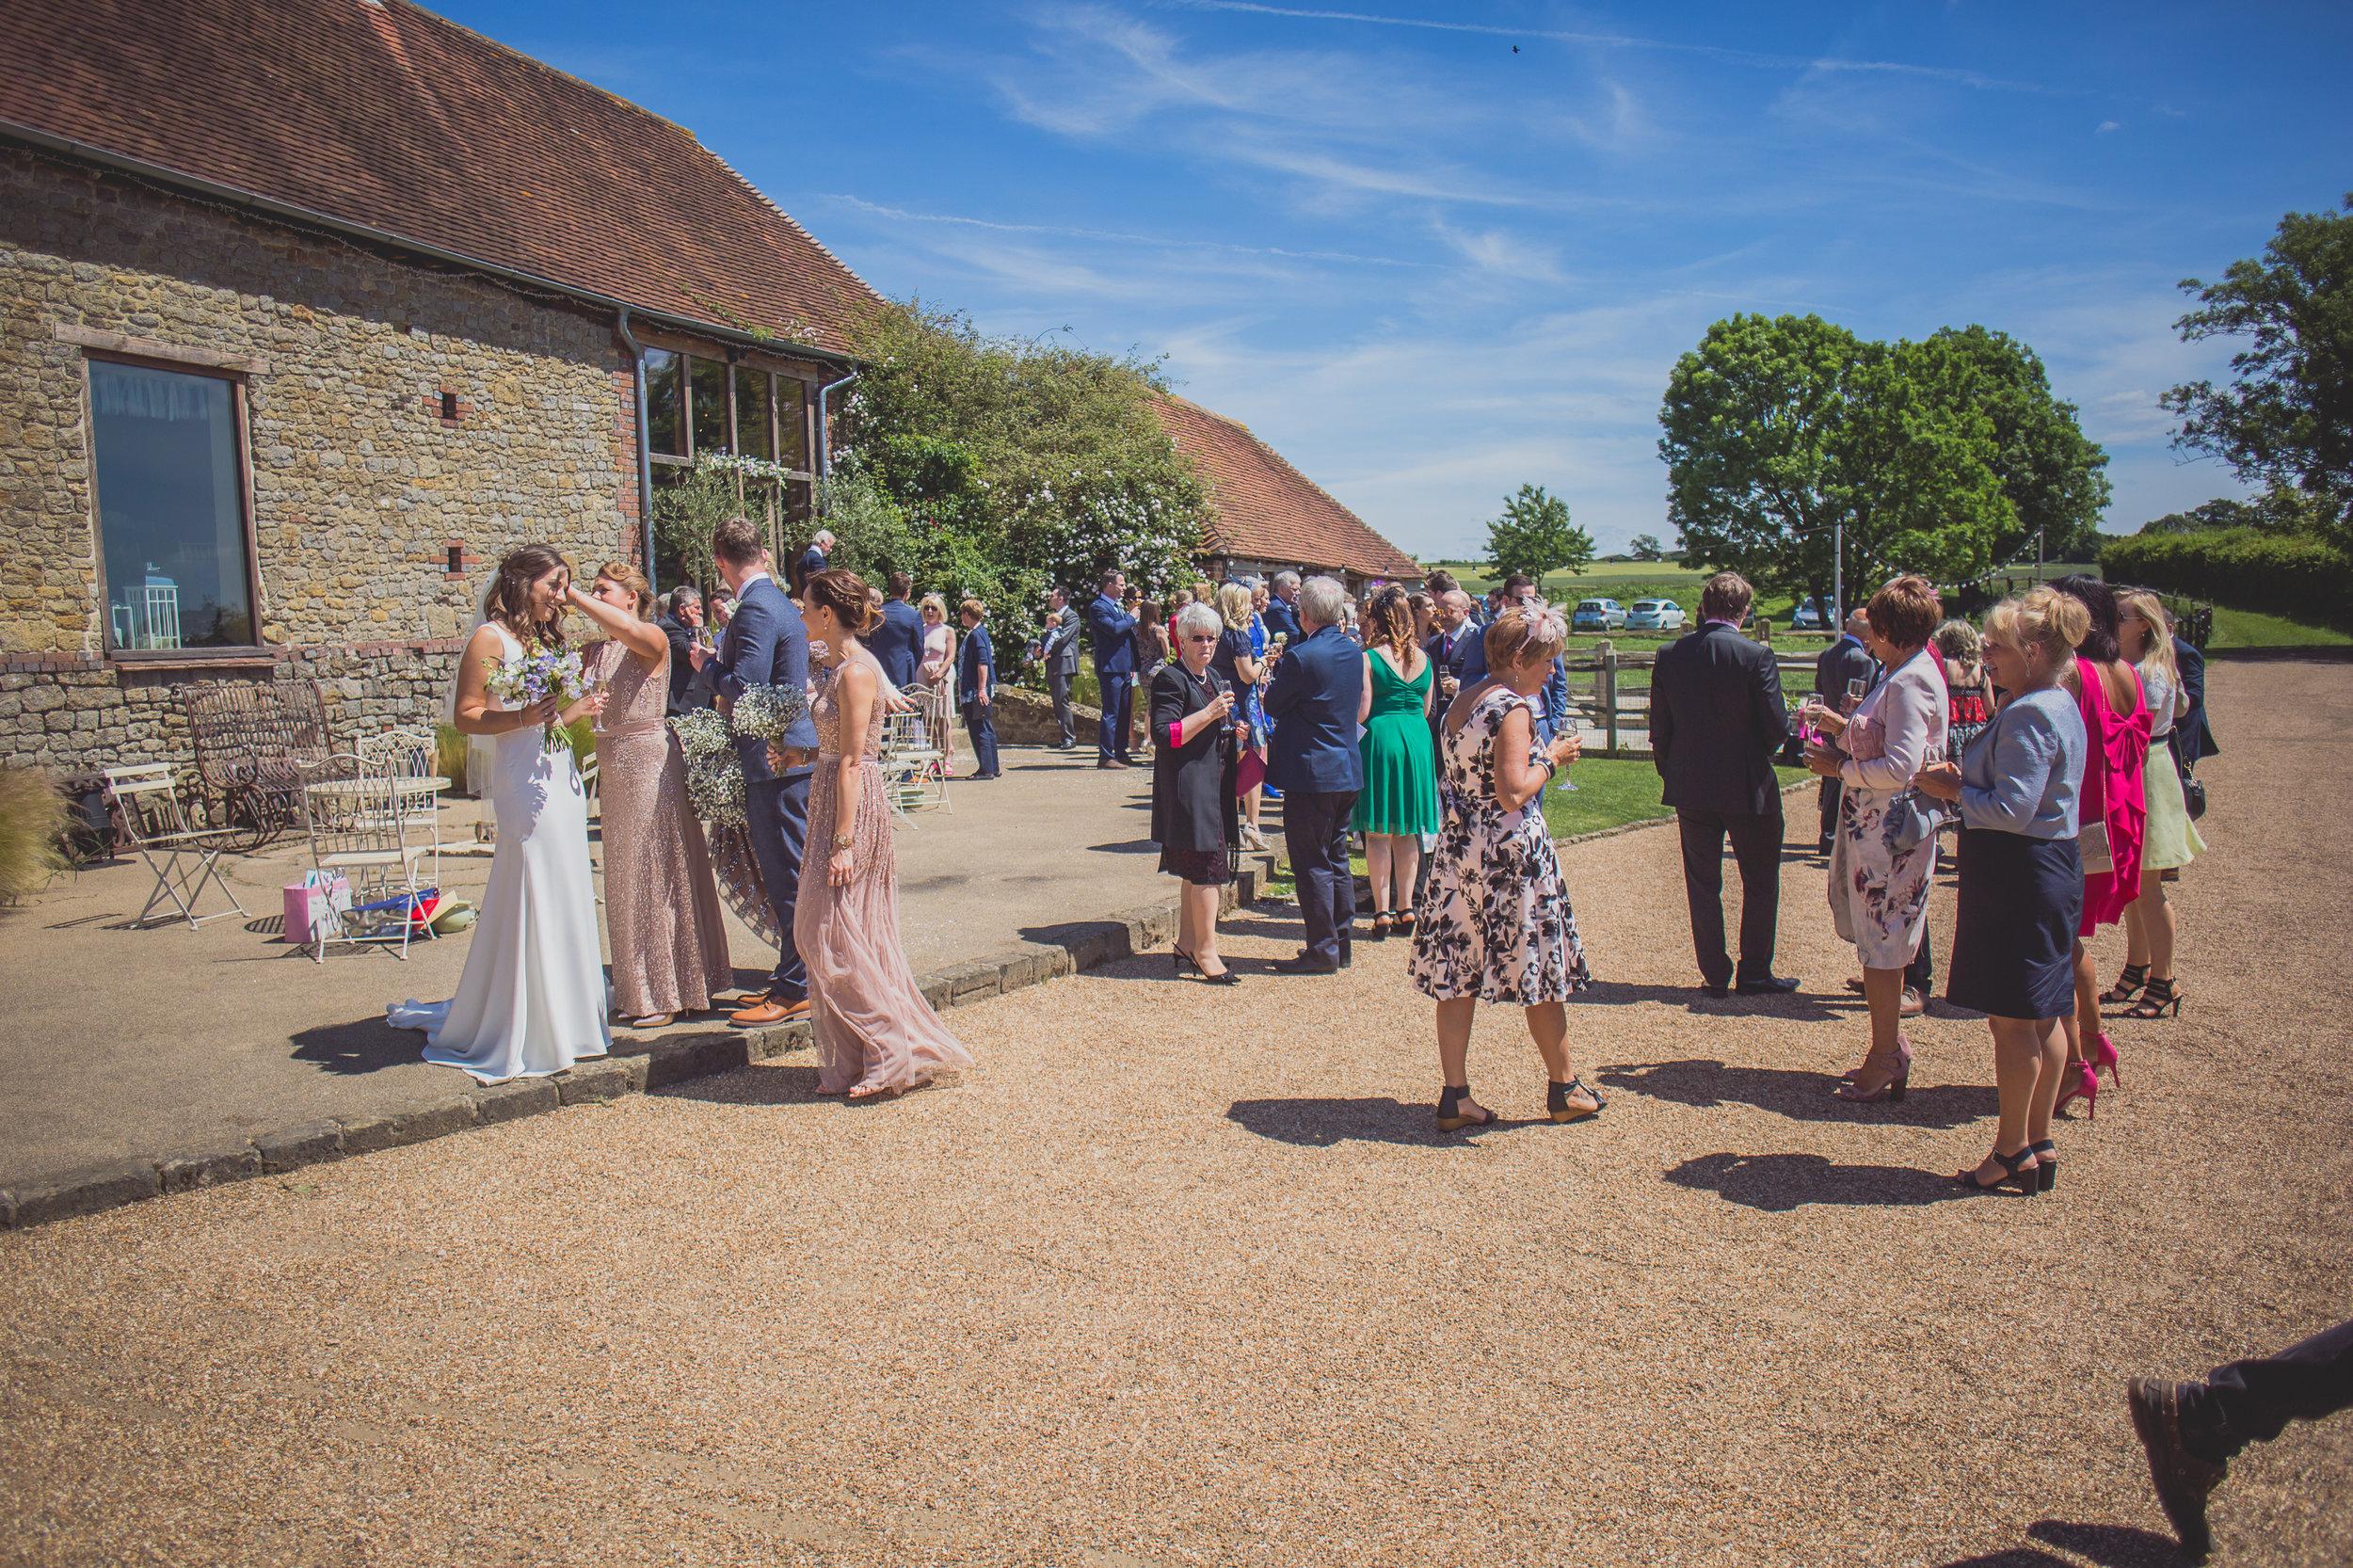 Grittenham Barn female wedding photographers west sussex petworth social-79.jpg